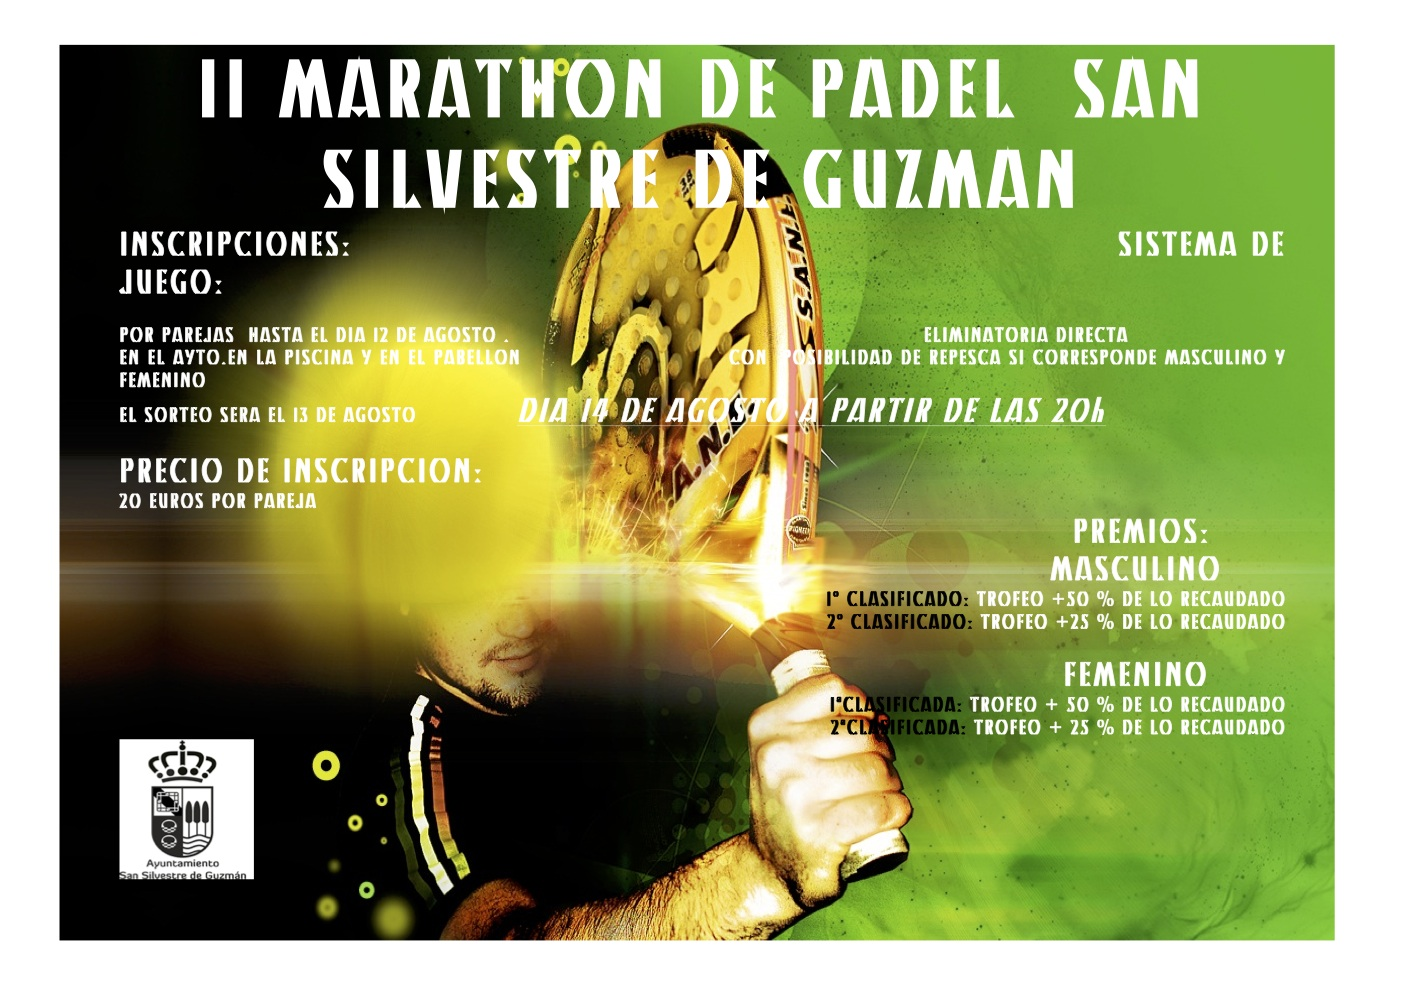 II Marathón de Pádel San silvestre de Guzmán